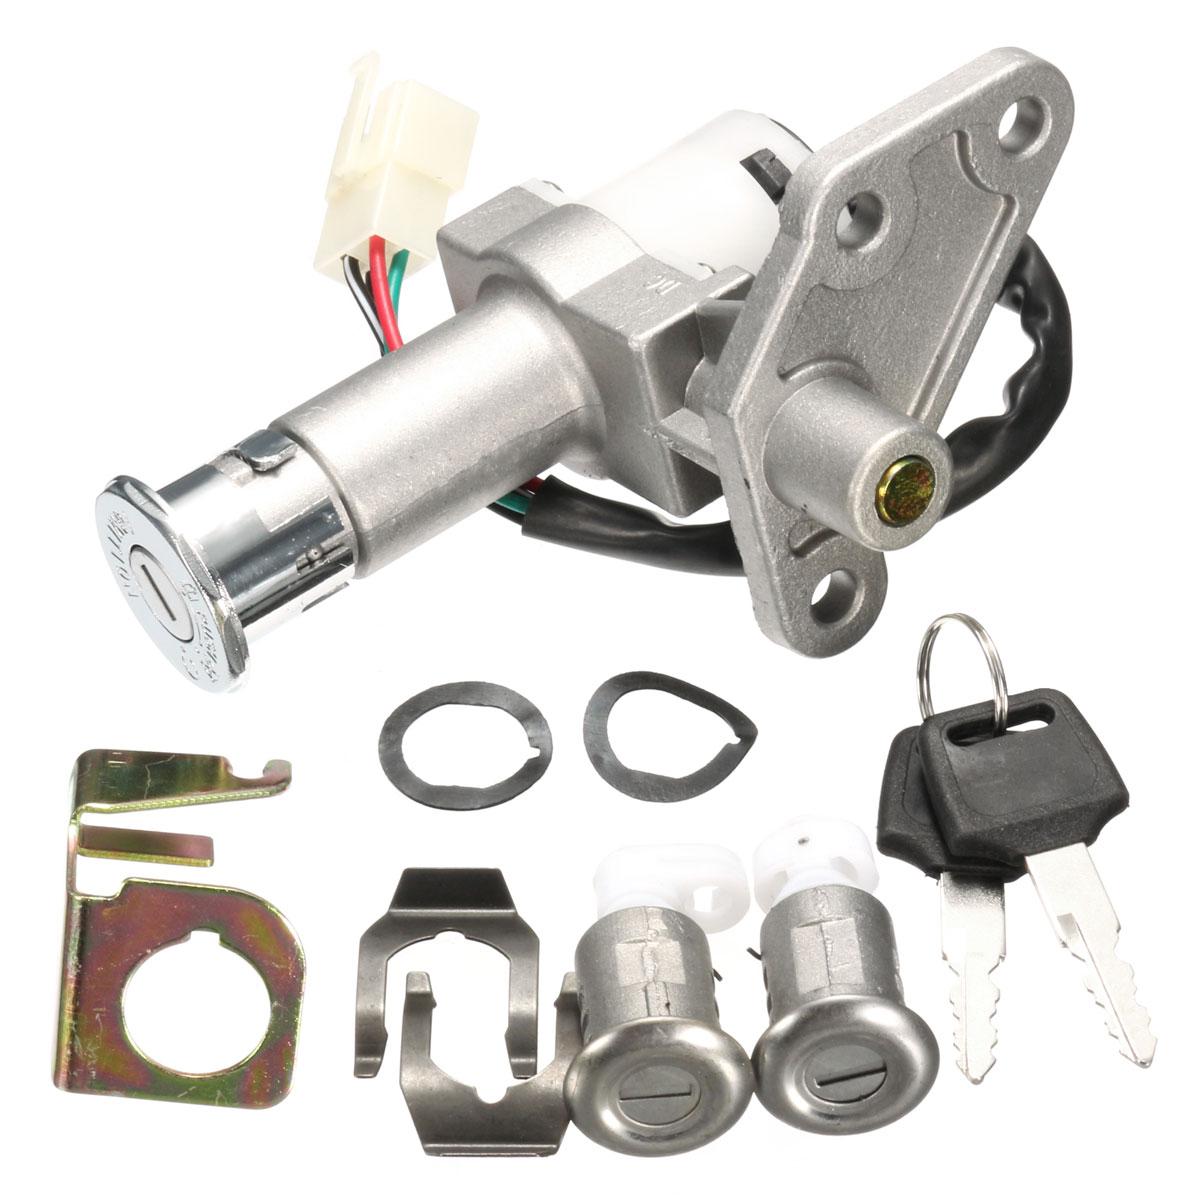 Zündschlüssel Lock Set Für 50cc 125cc 150cc GY6 Moped Motorrad Roller